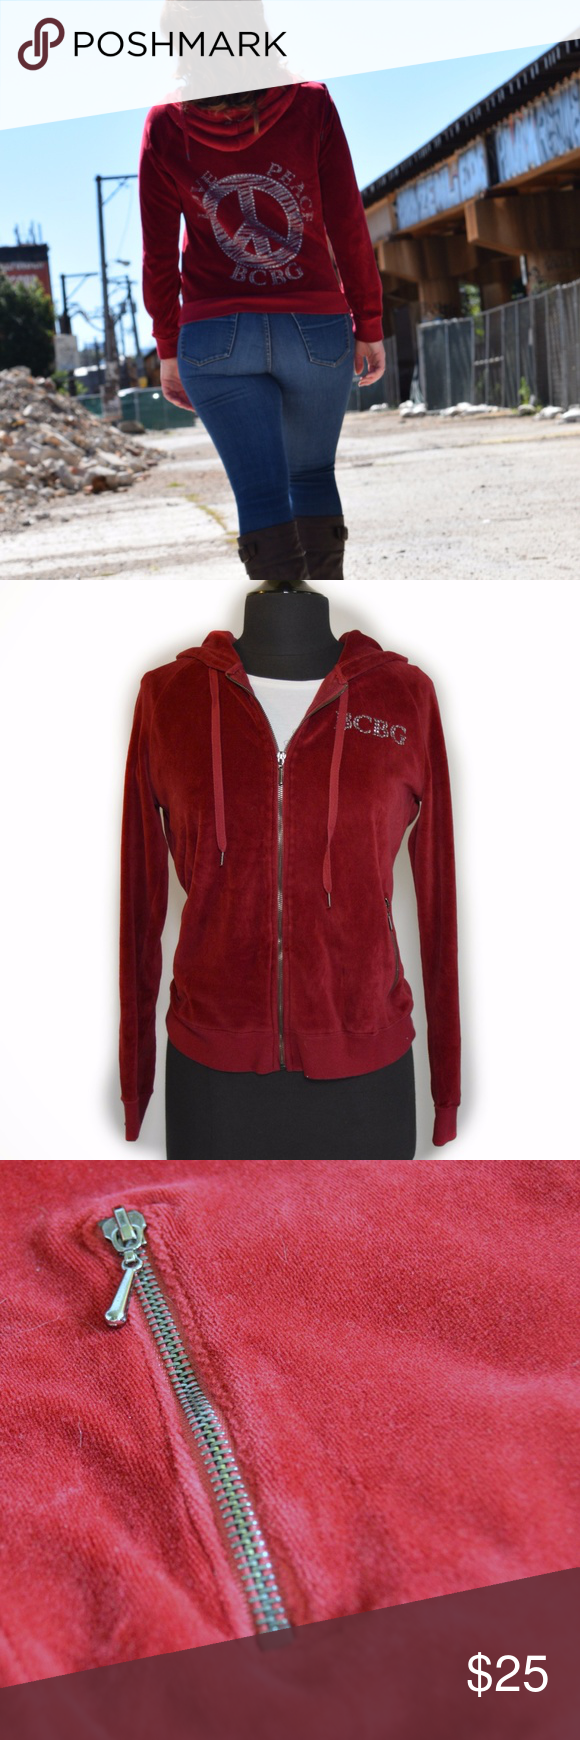 Bcbg love u peace red velour hoodie jacket shopmycloset poshmark